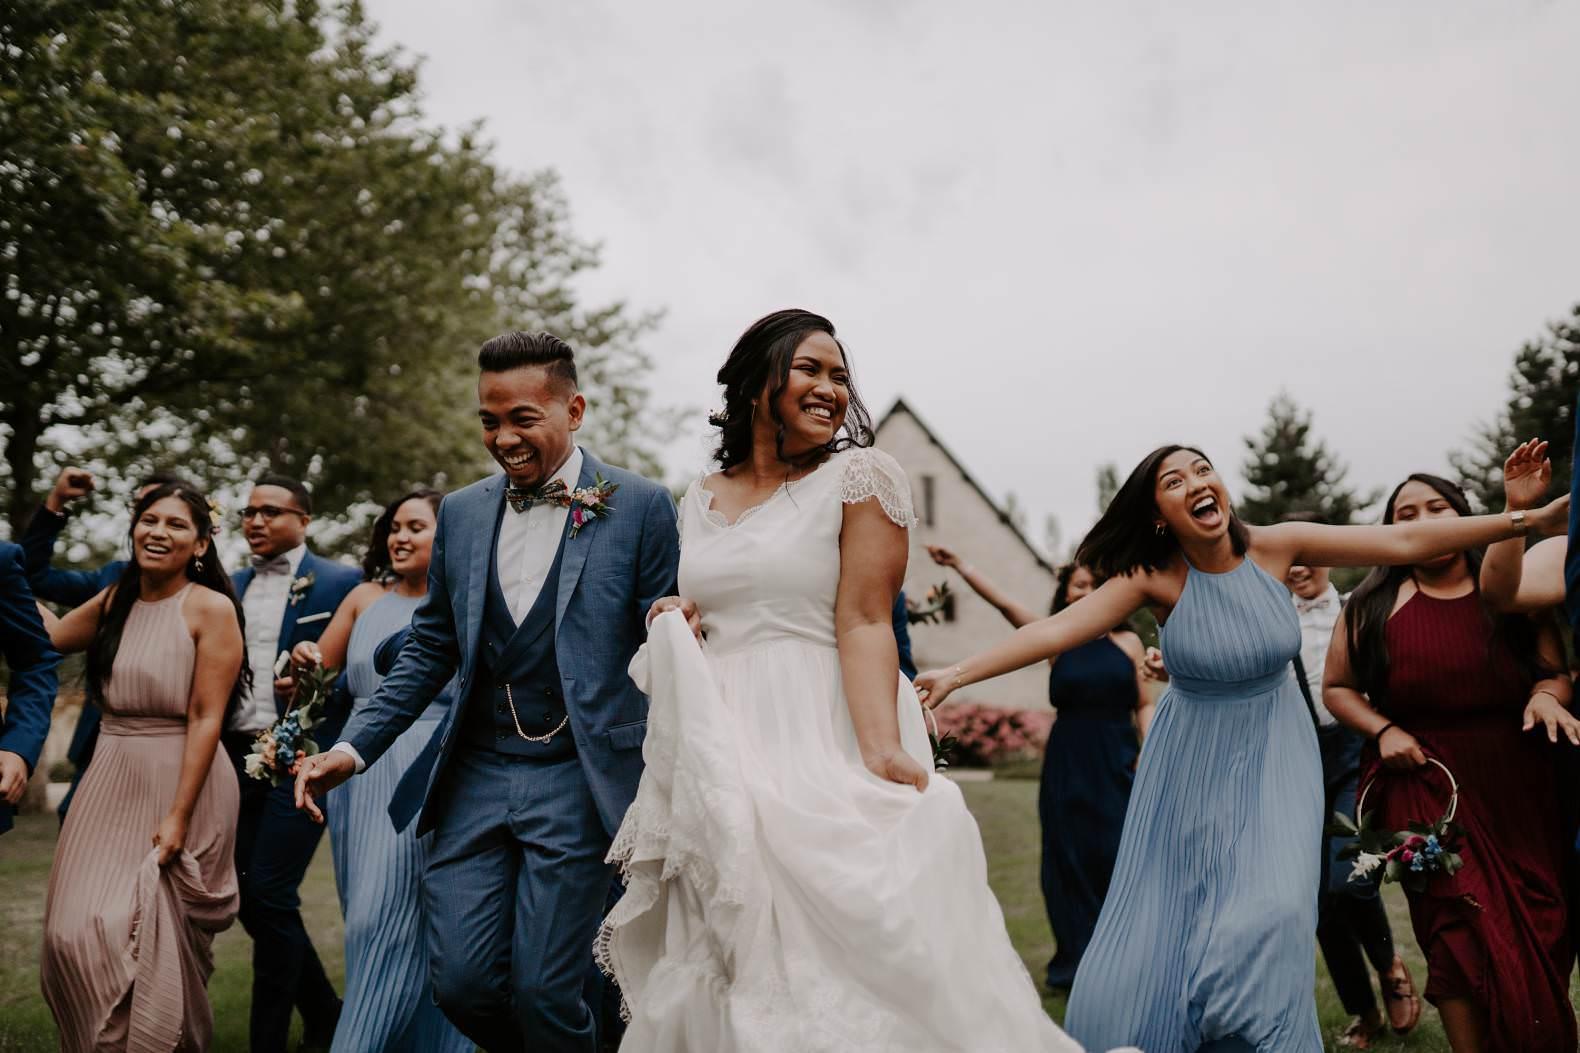 mariage manoir de corny photographe bel esprit 0051 1